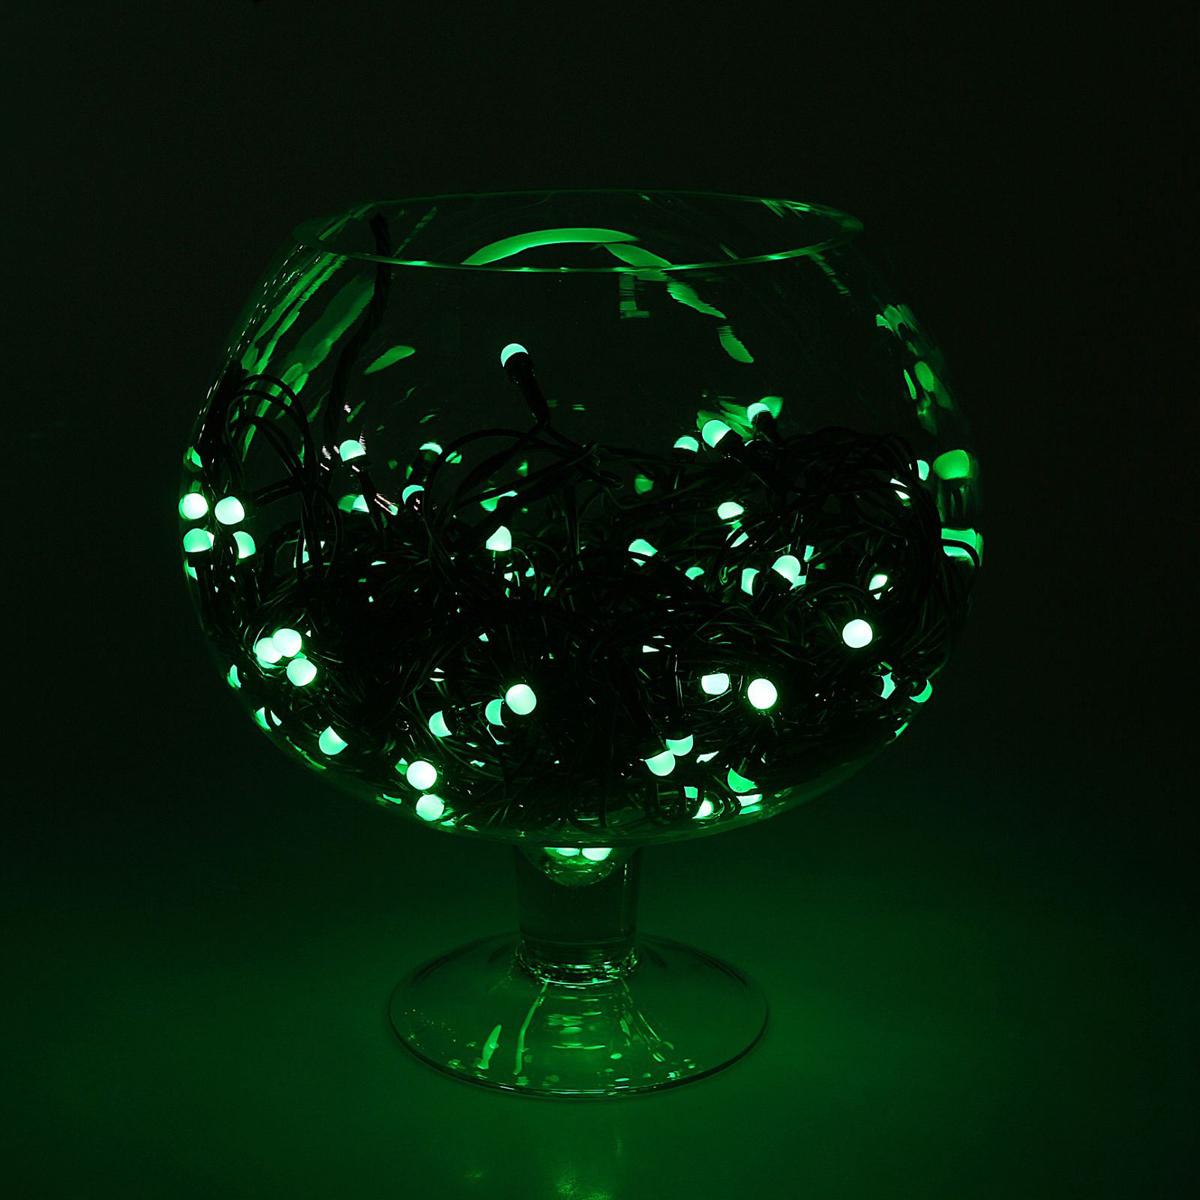 Гирлянда Luazon Метраж, длина 20 м, LED 200 ламп, 220V, цвет: зеленый гирлянда luazon метраж свечка 5m led 20 220v multicolor 2388694